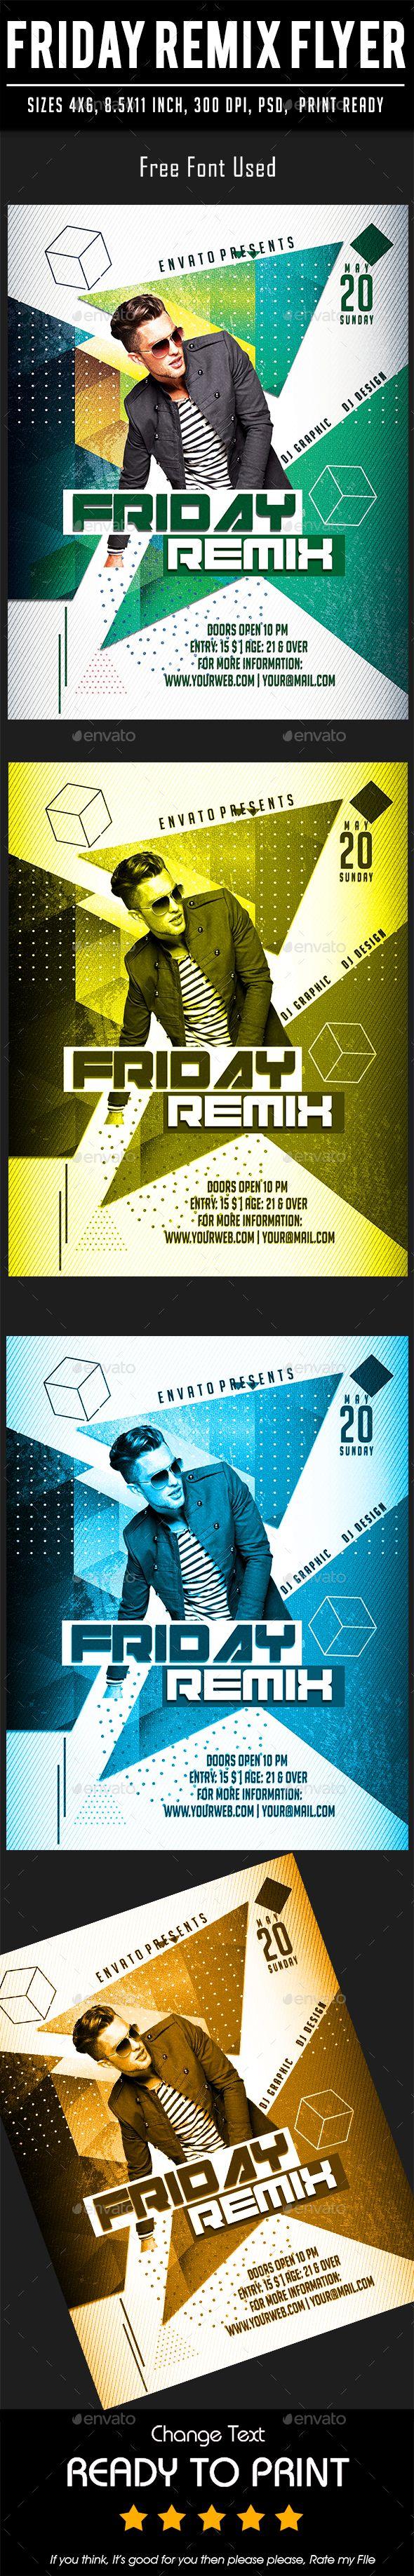 Friday Remix Flyer Template PSD